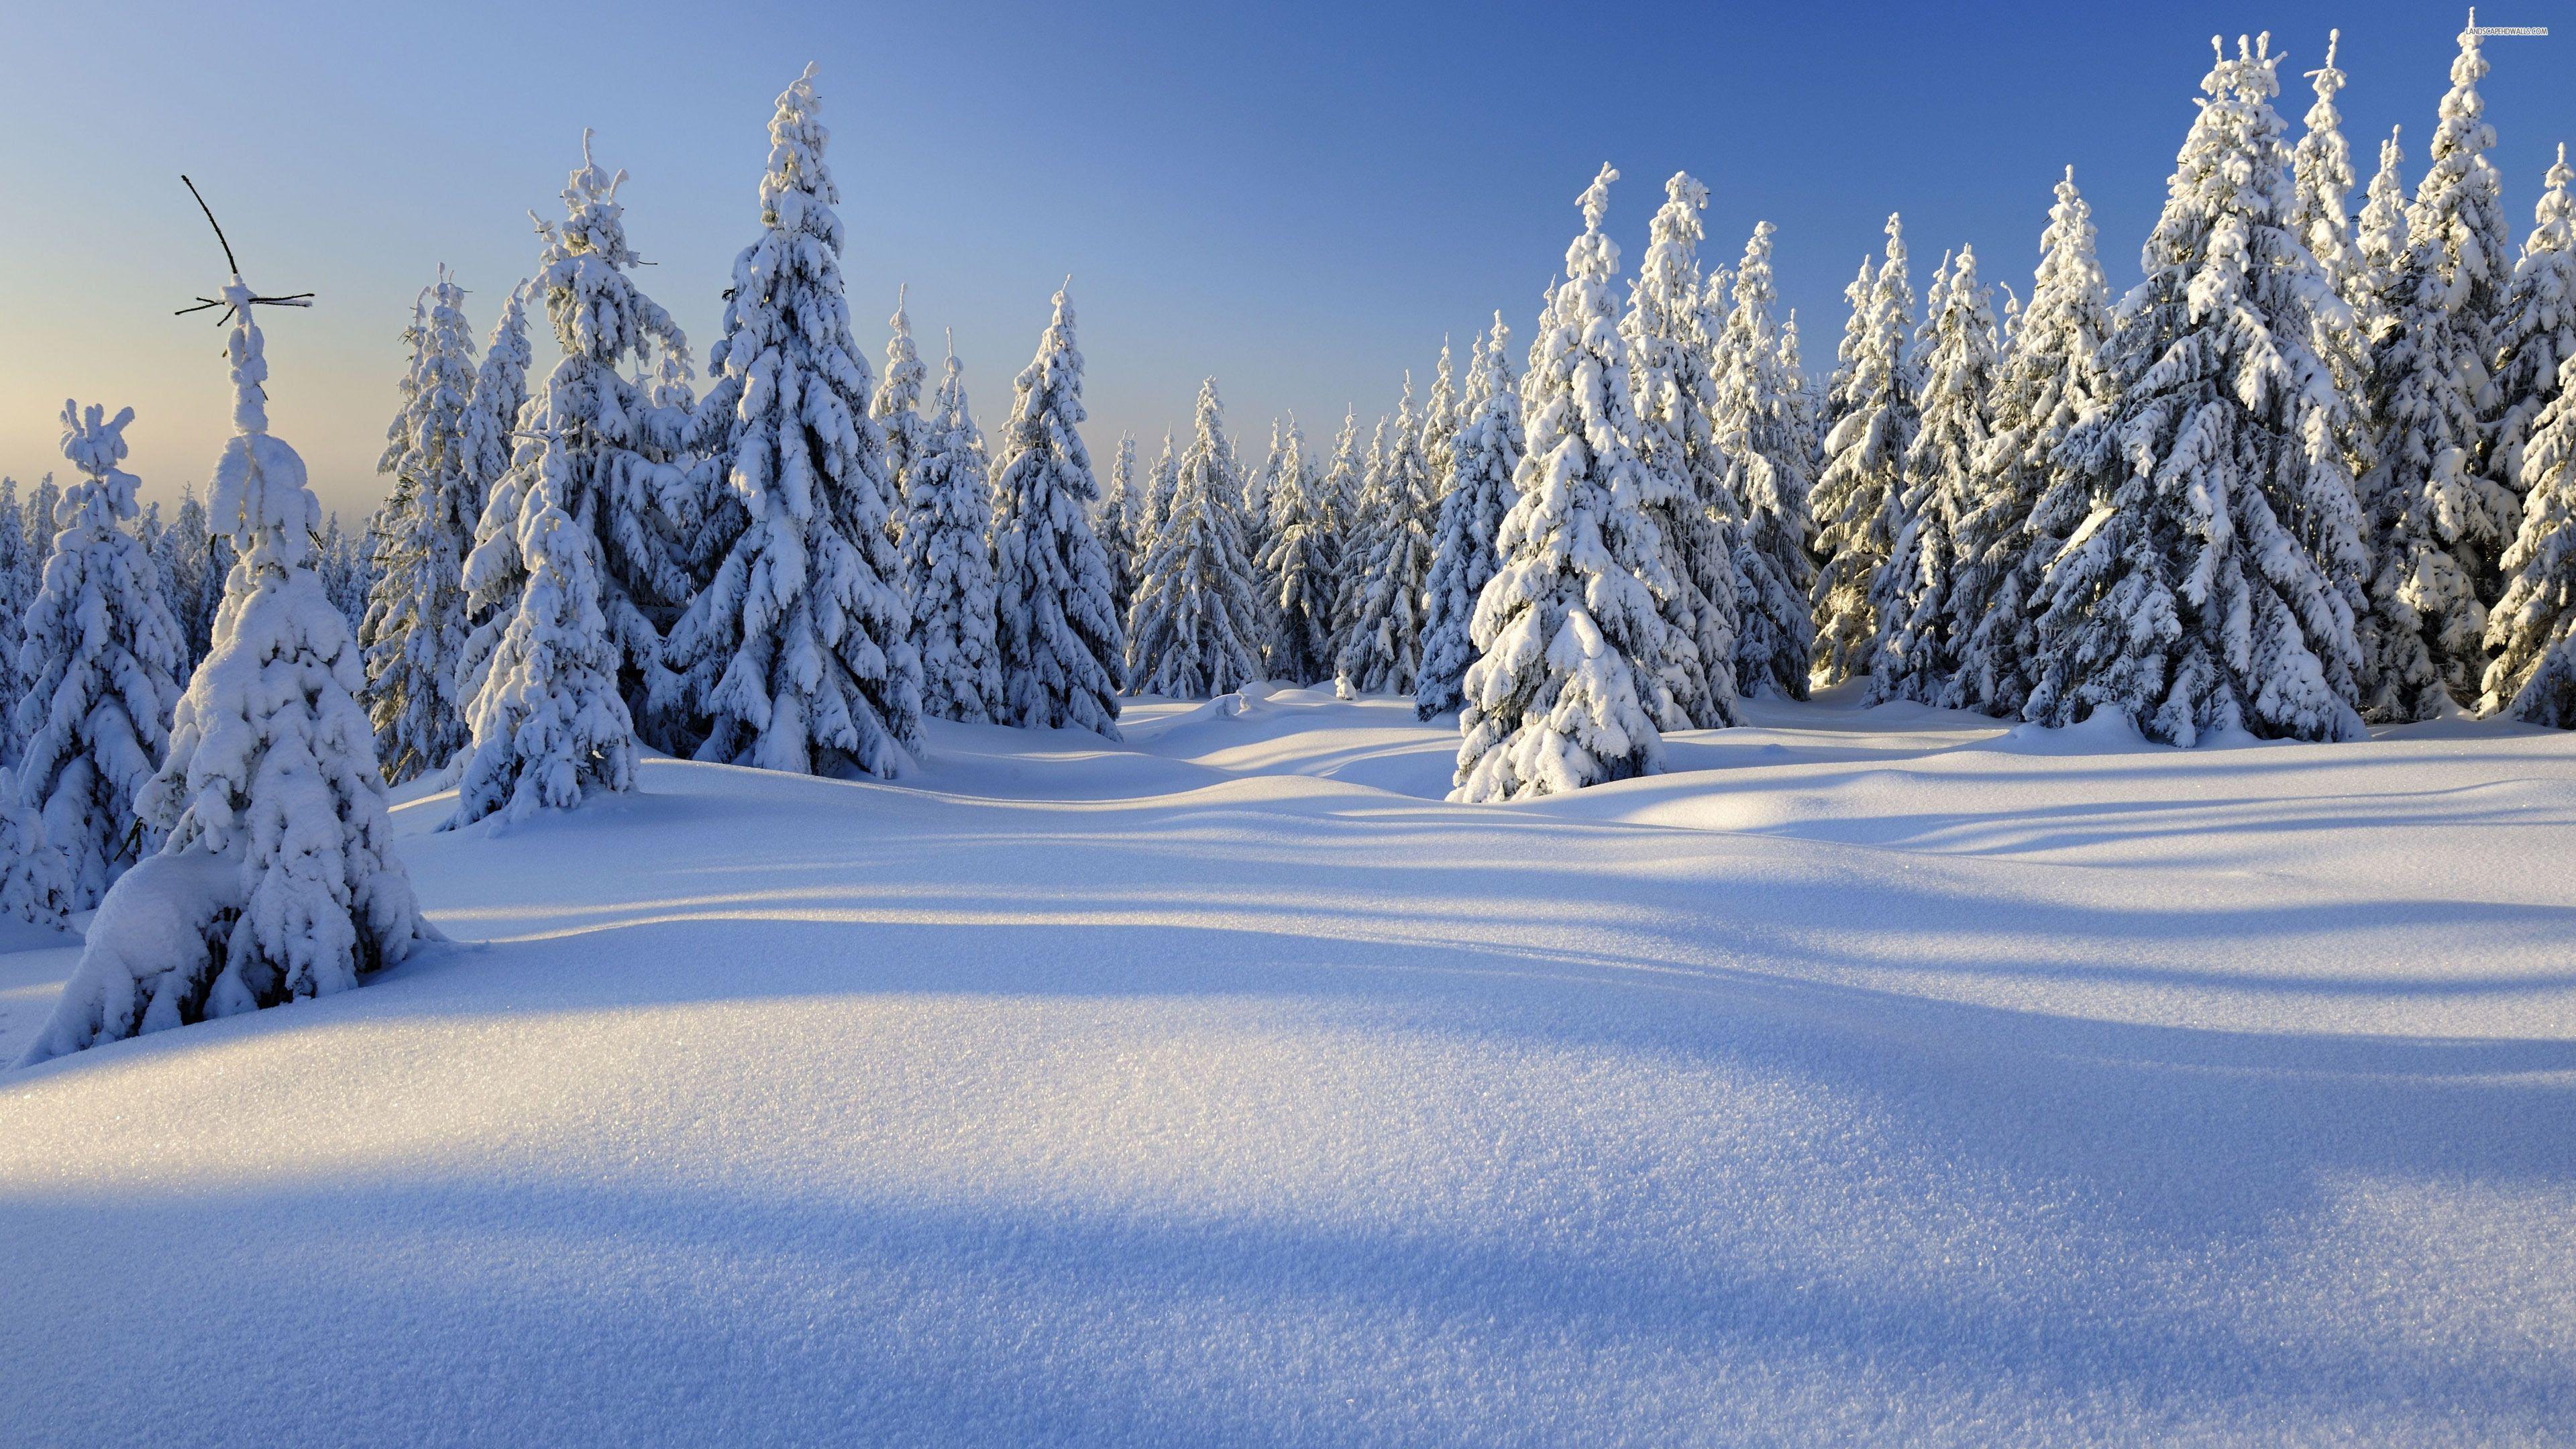 Winter HD Wallpapers Backgrounds Wallpaper